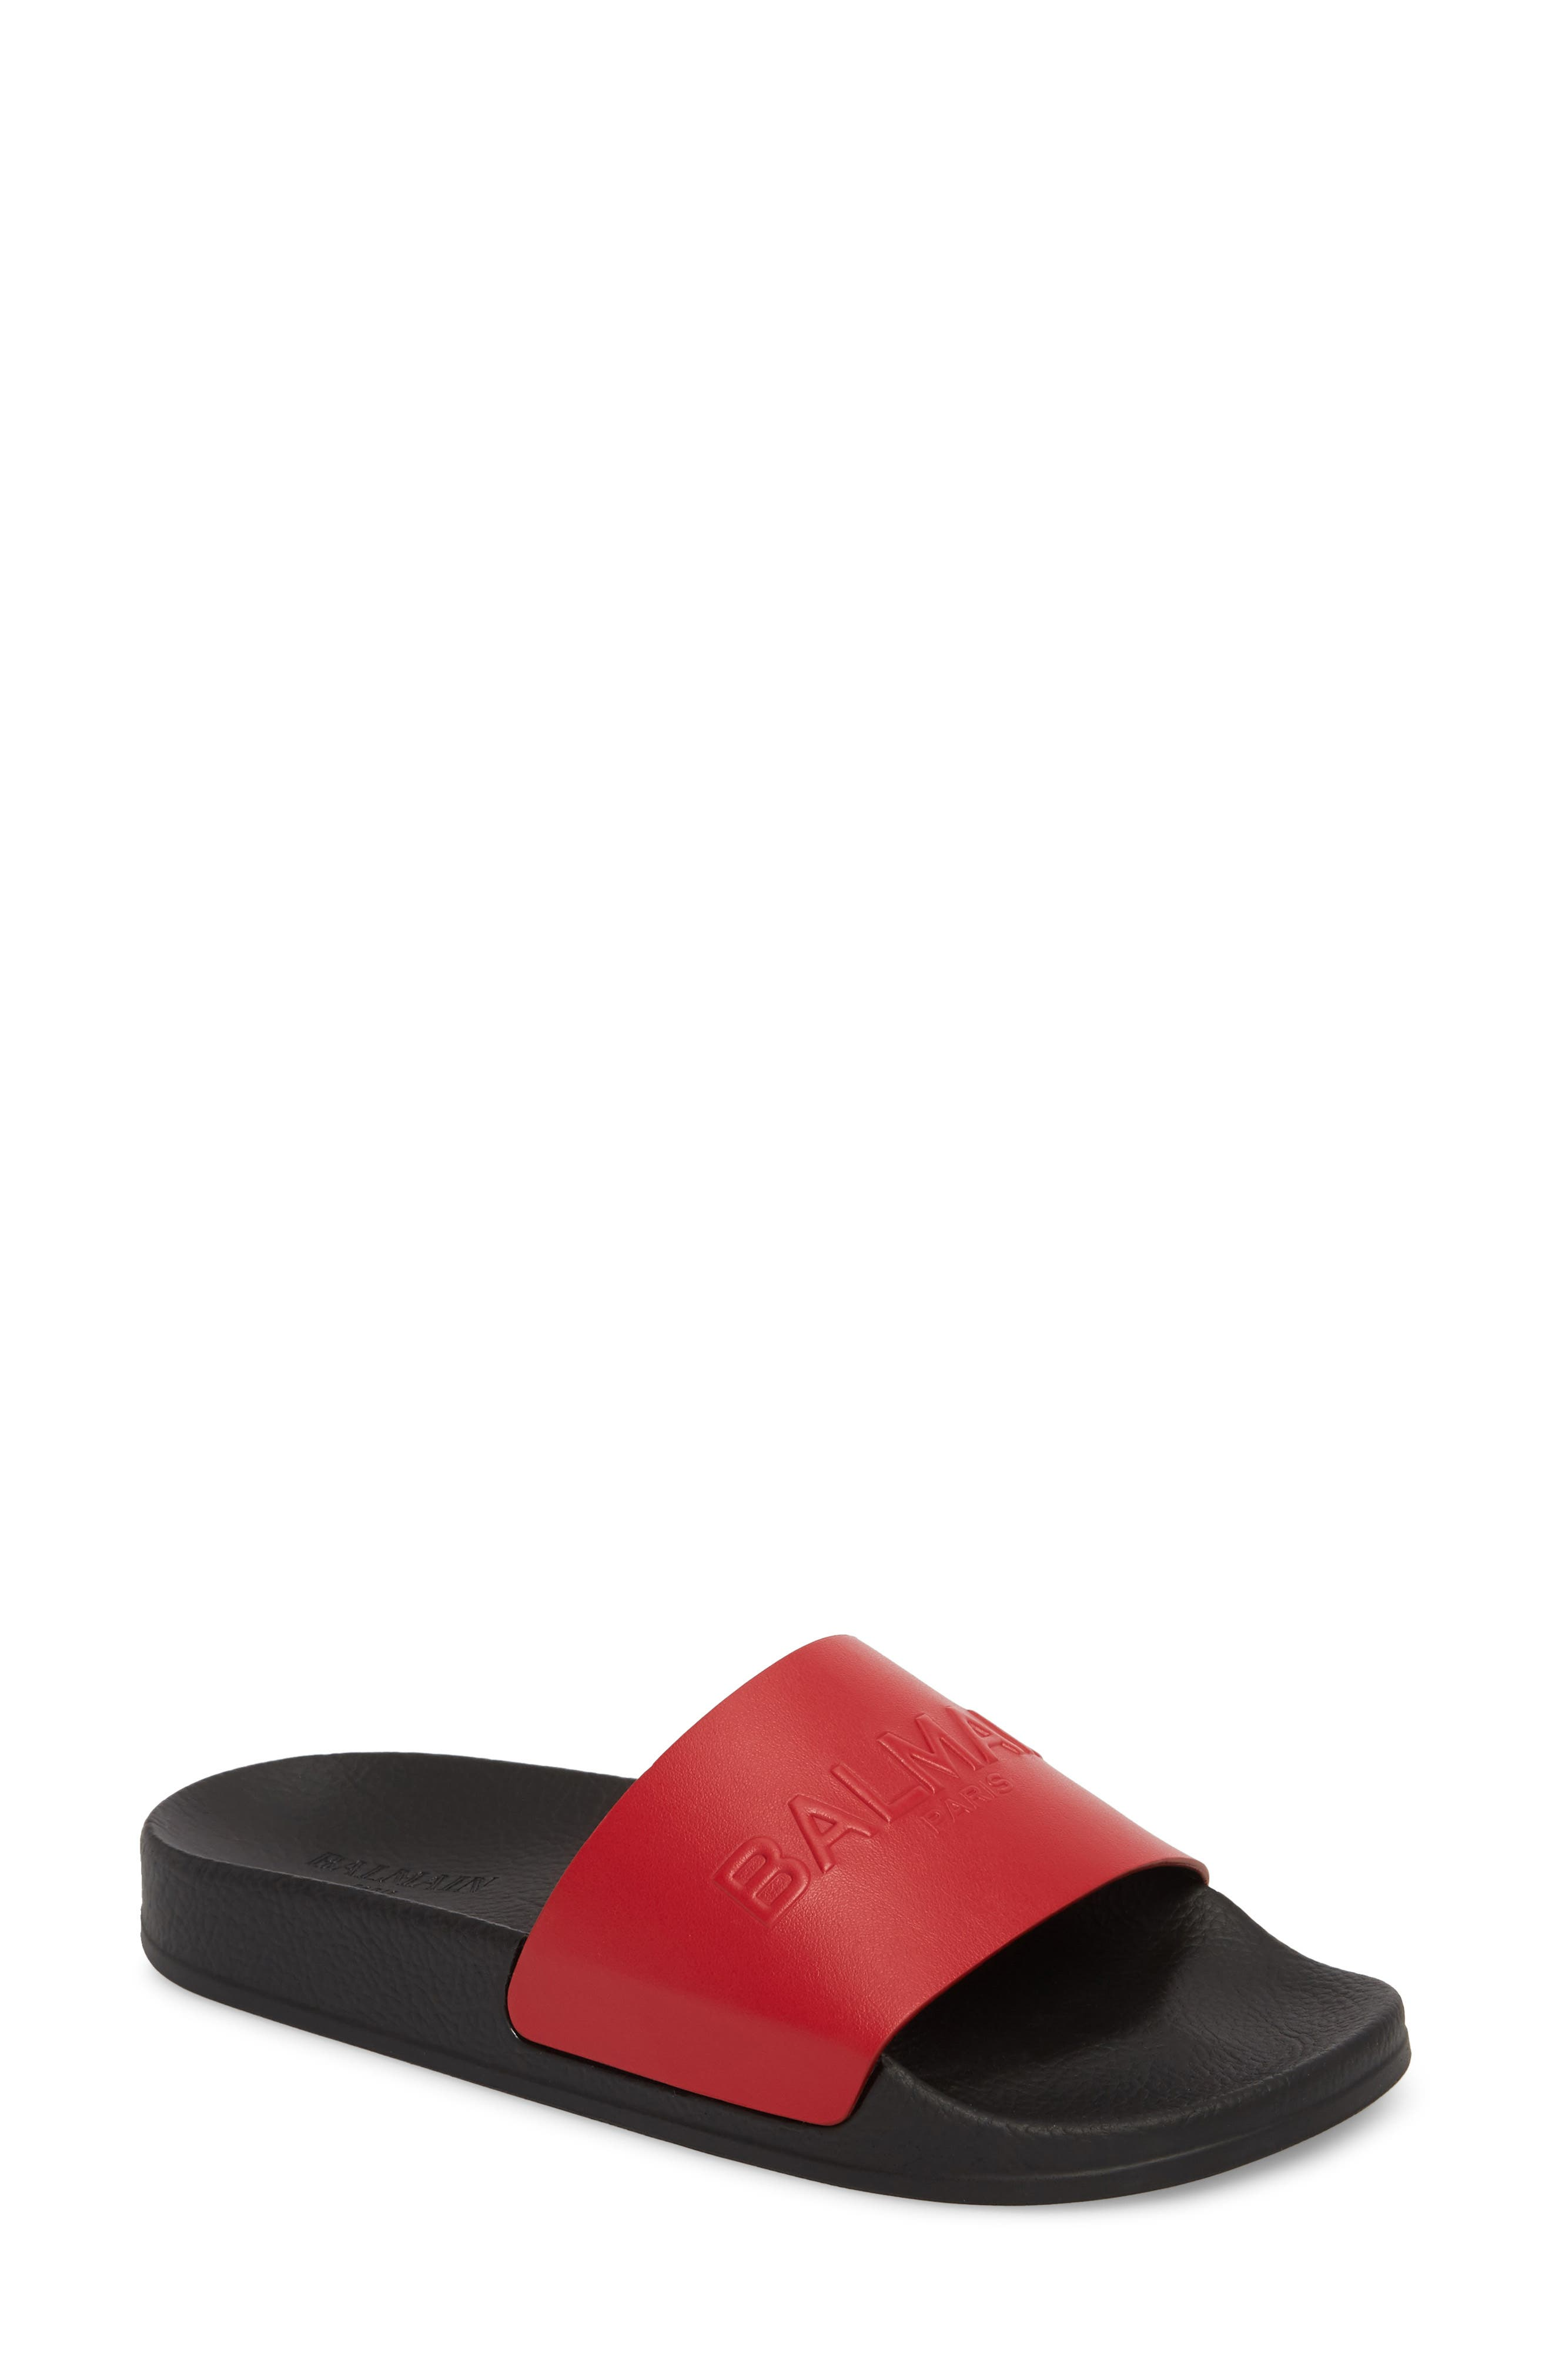 Main Image - Balmain Calypso Logo Strap Slide Sandal (Women)